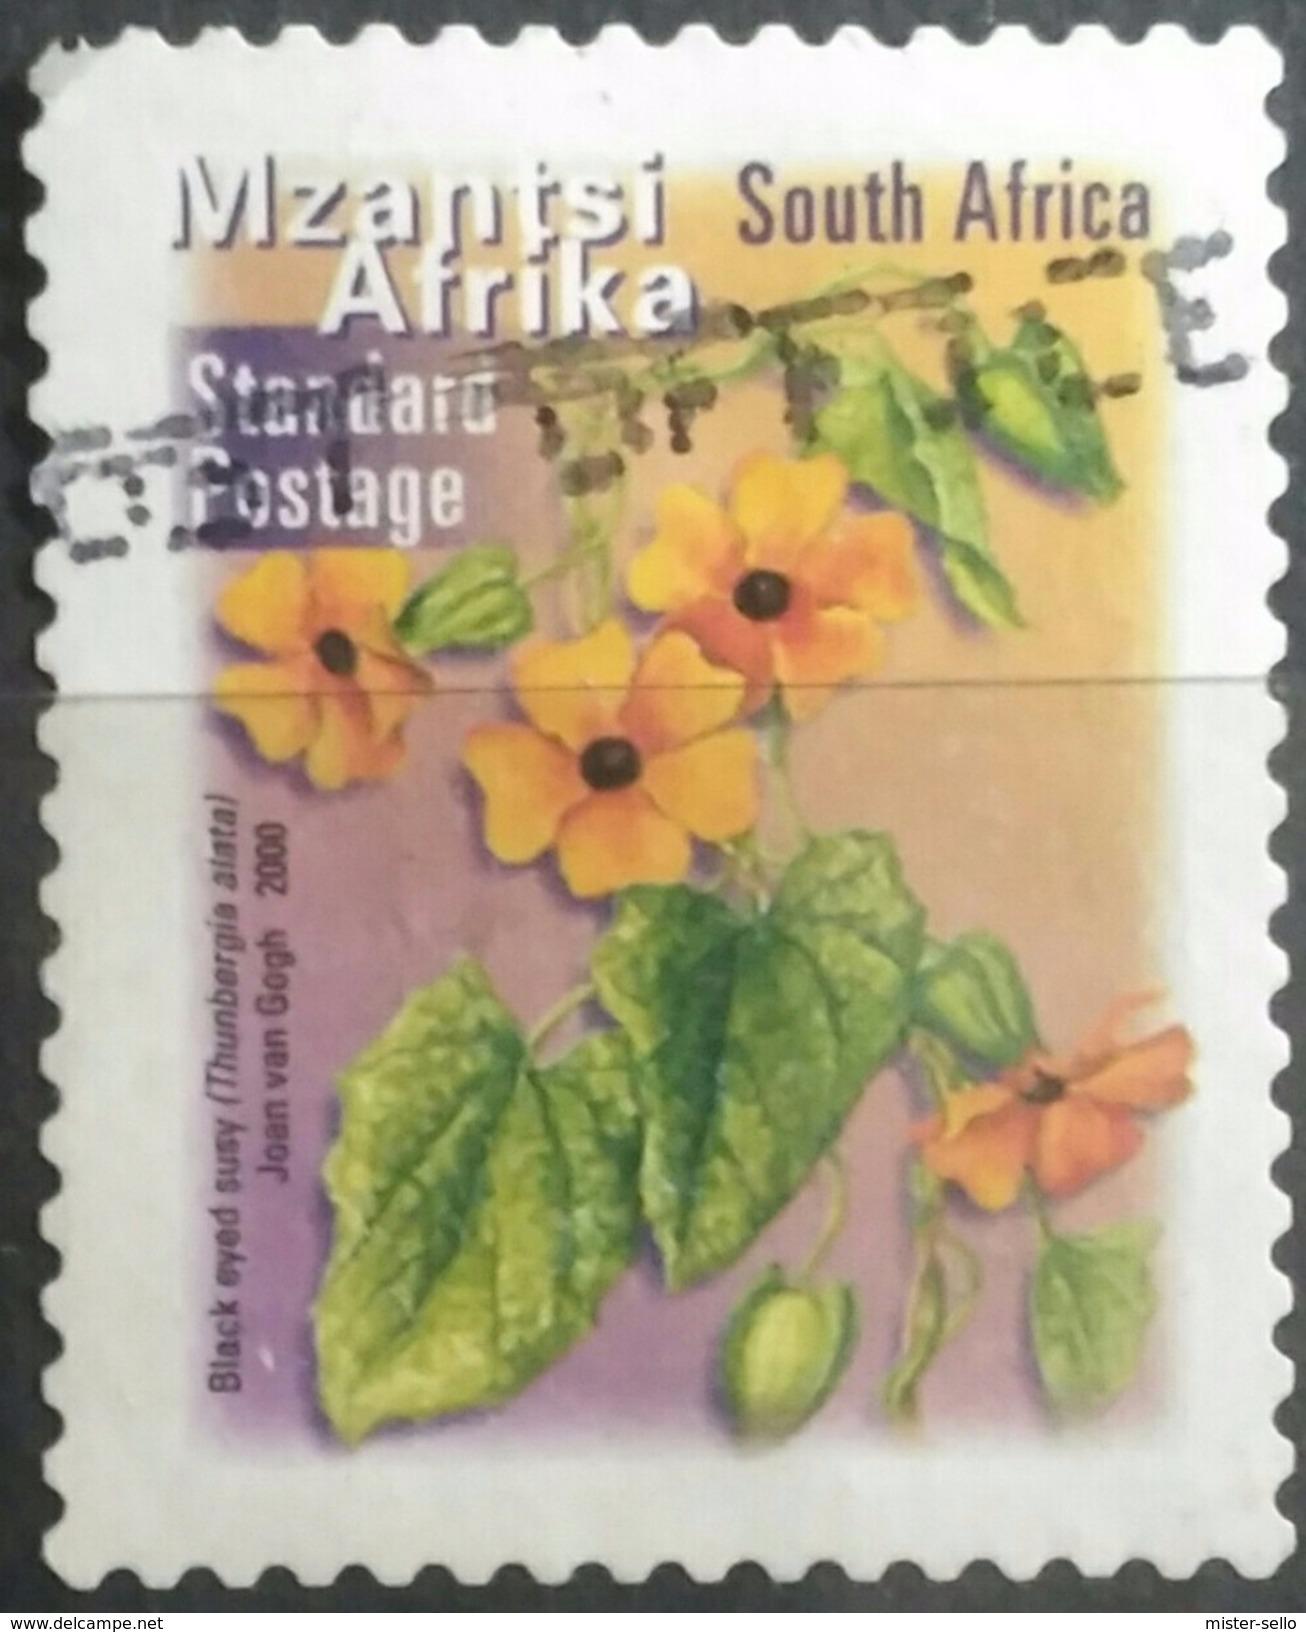 SUDAFRICA - AFRICA DEL SUR 2001 Fauna And Flora. USADO - USED. - África Del Sur (1961-...)